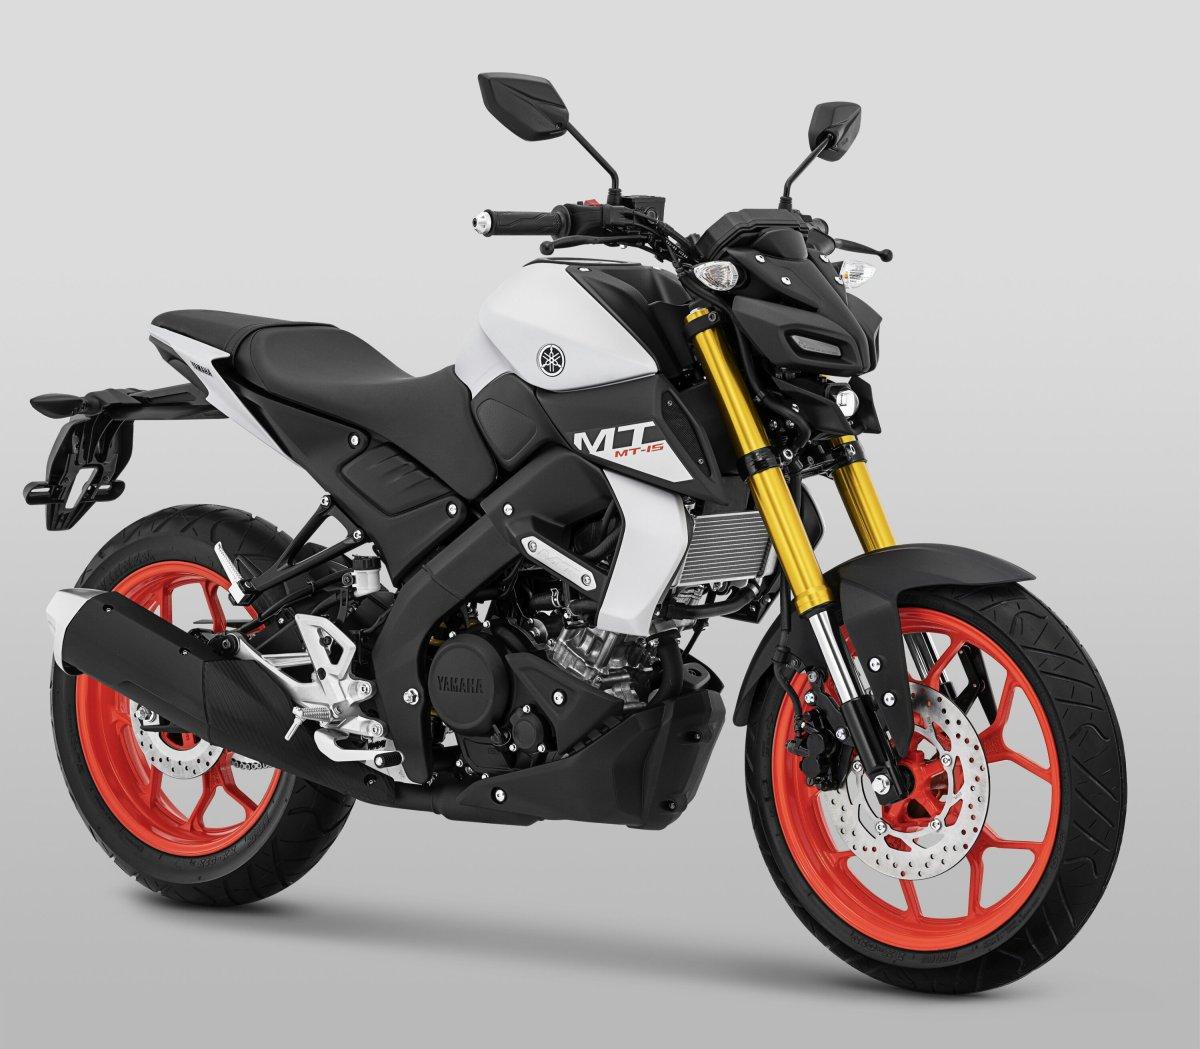 Harga Yamaha MT 15 2019, Cukup Menggoda